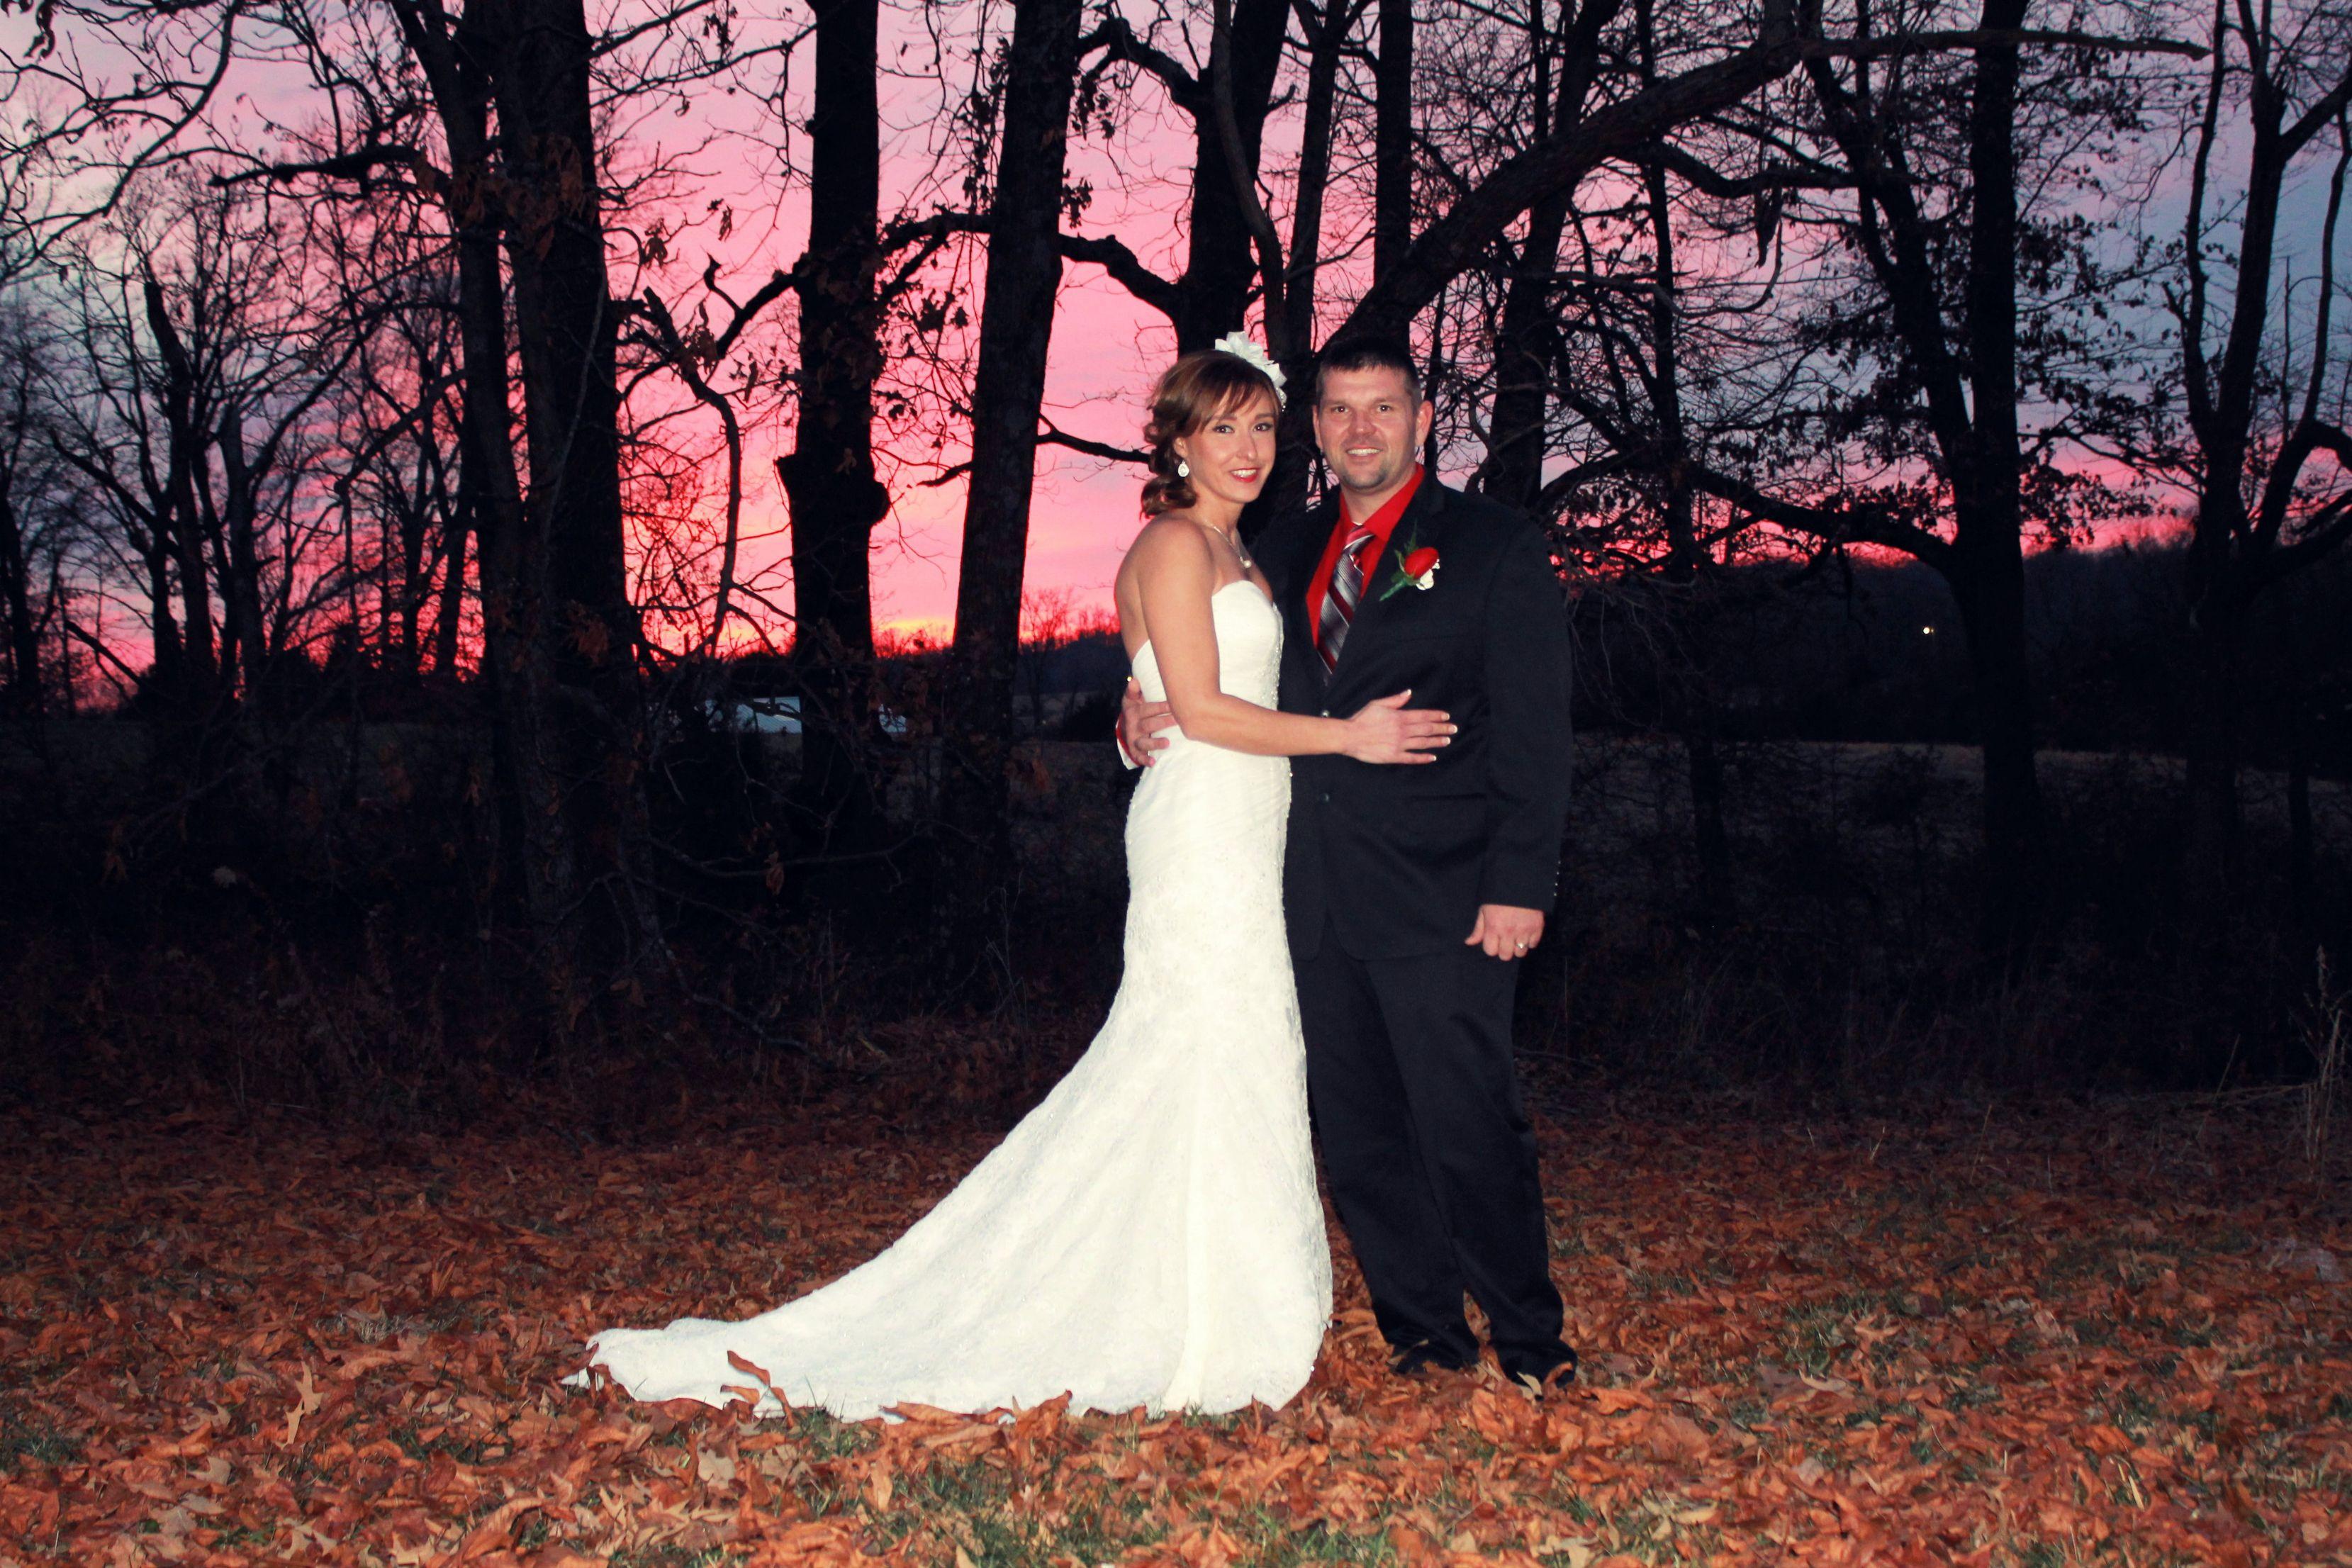 kentucky wedding chapel | elope in kentucky | affordable wedding